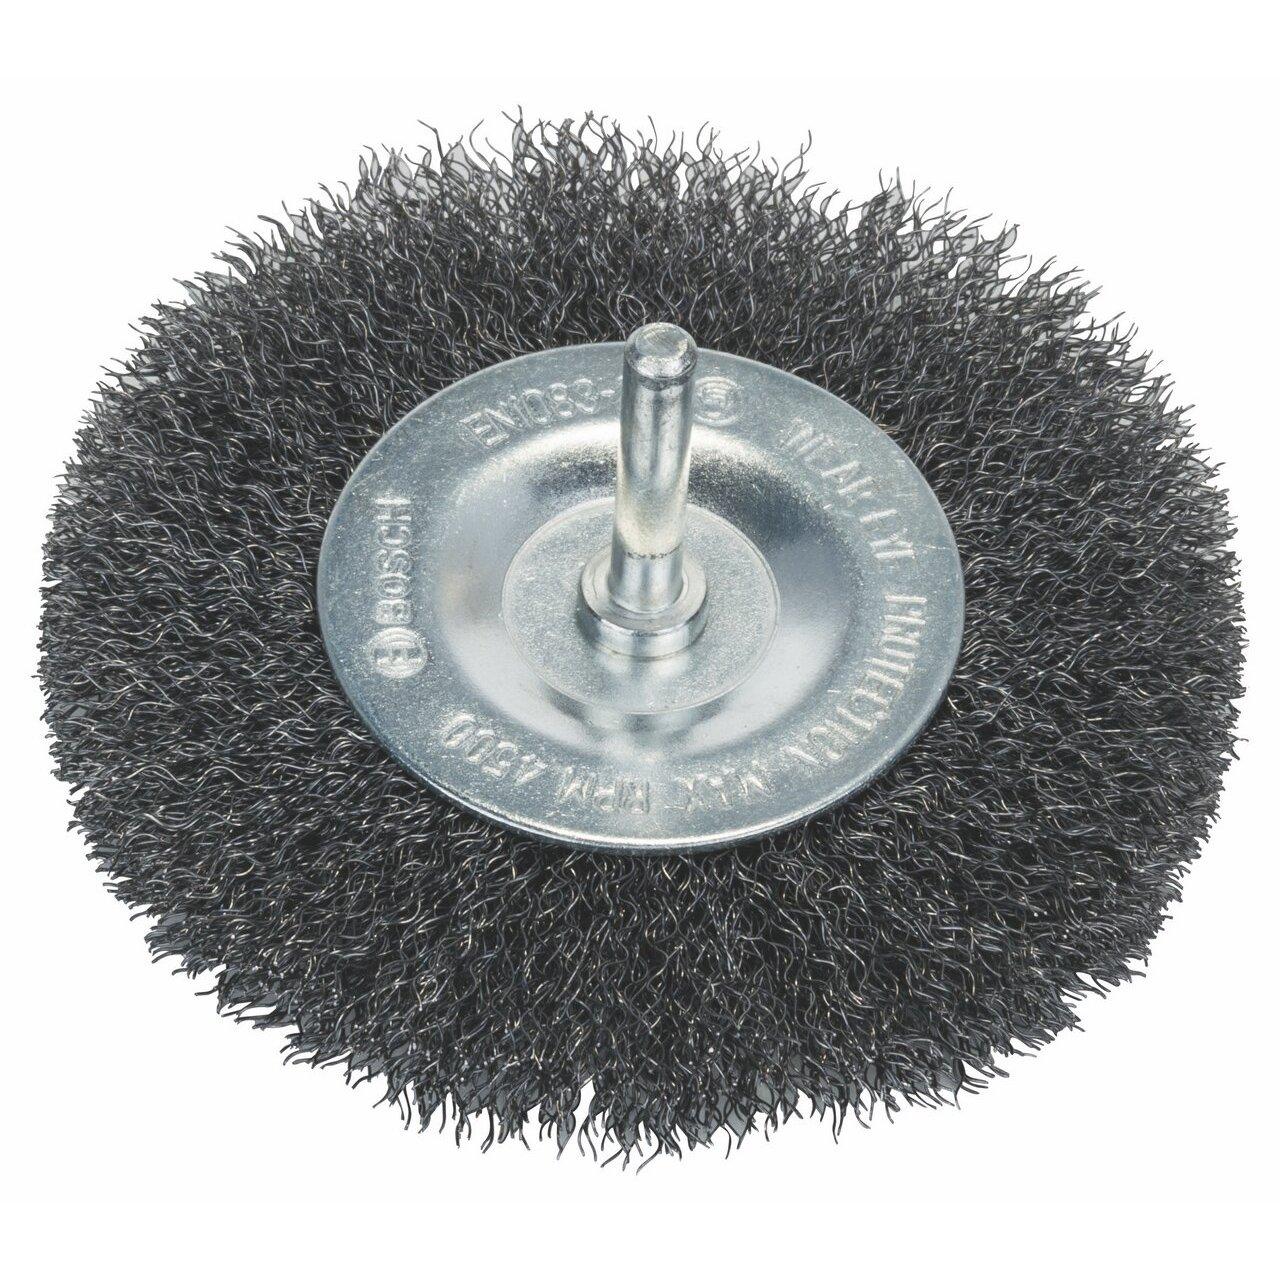 Bosch 1 609 200 273 1609200273 Brosse Circulaire 100 mm 0,3 mm 10 mm à Fils ondulés, Gris, 100 x 0,3 x 10 mm